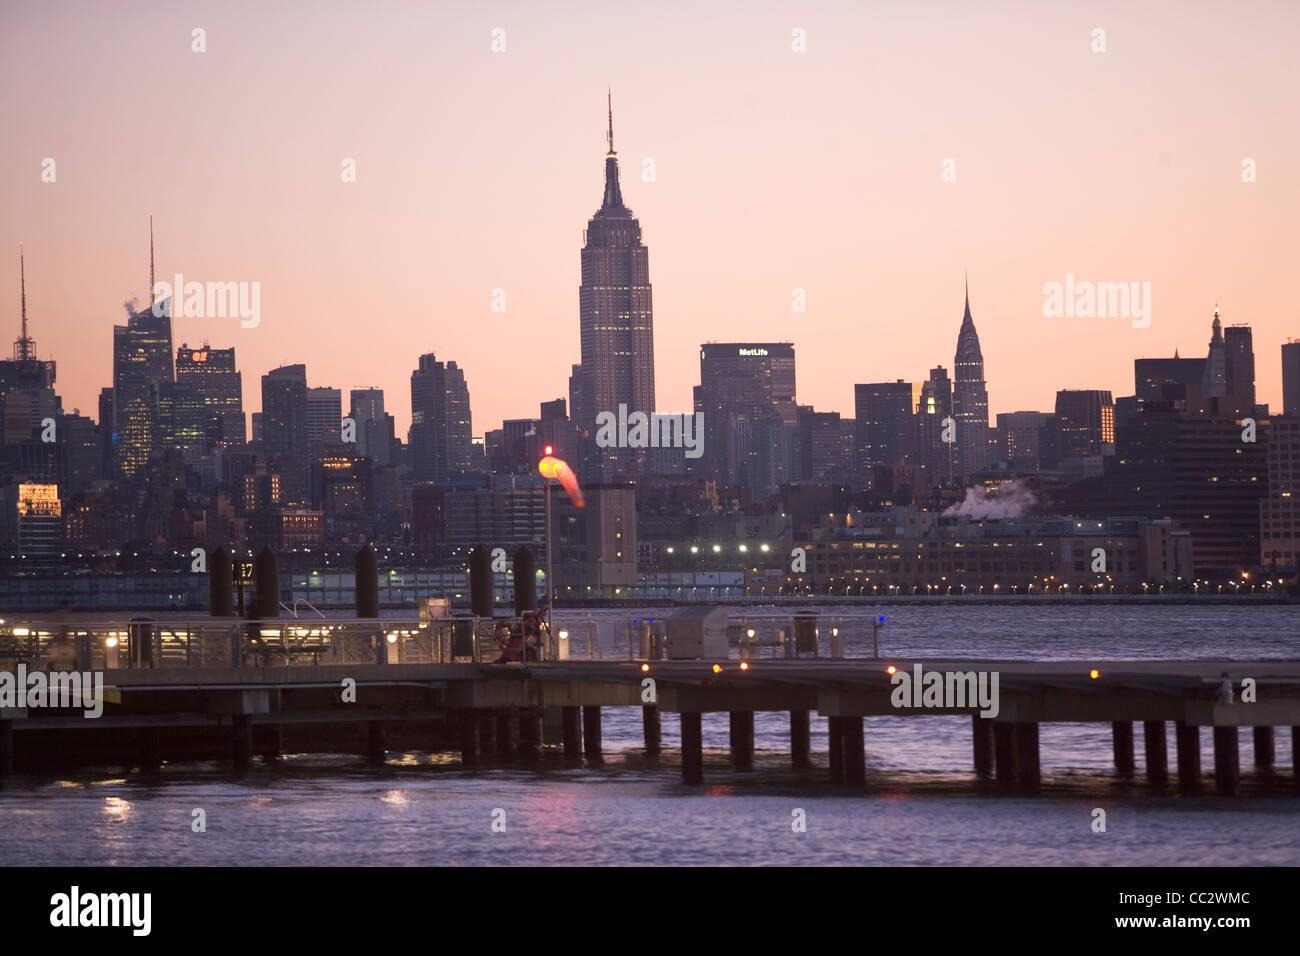 USA, New York City, Hudson River and Manhattan skyline - Stock Image